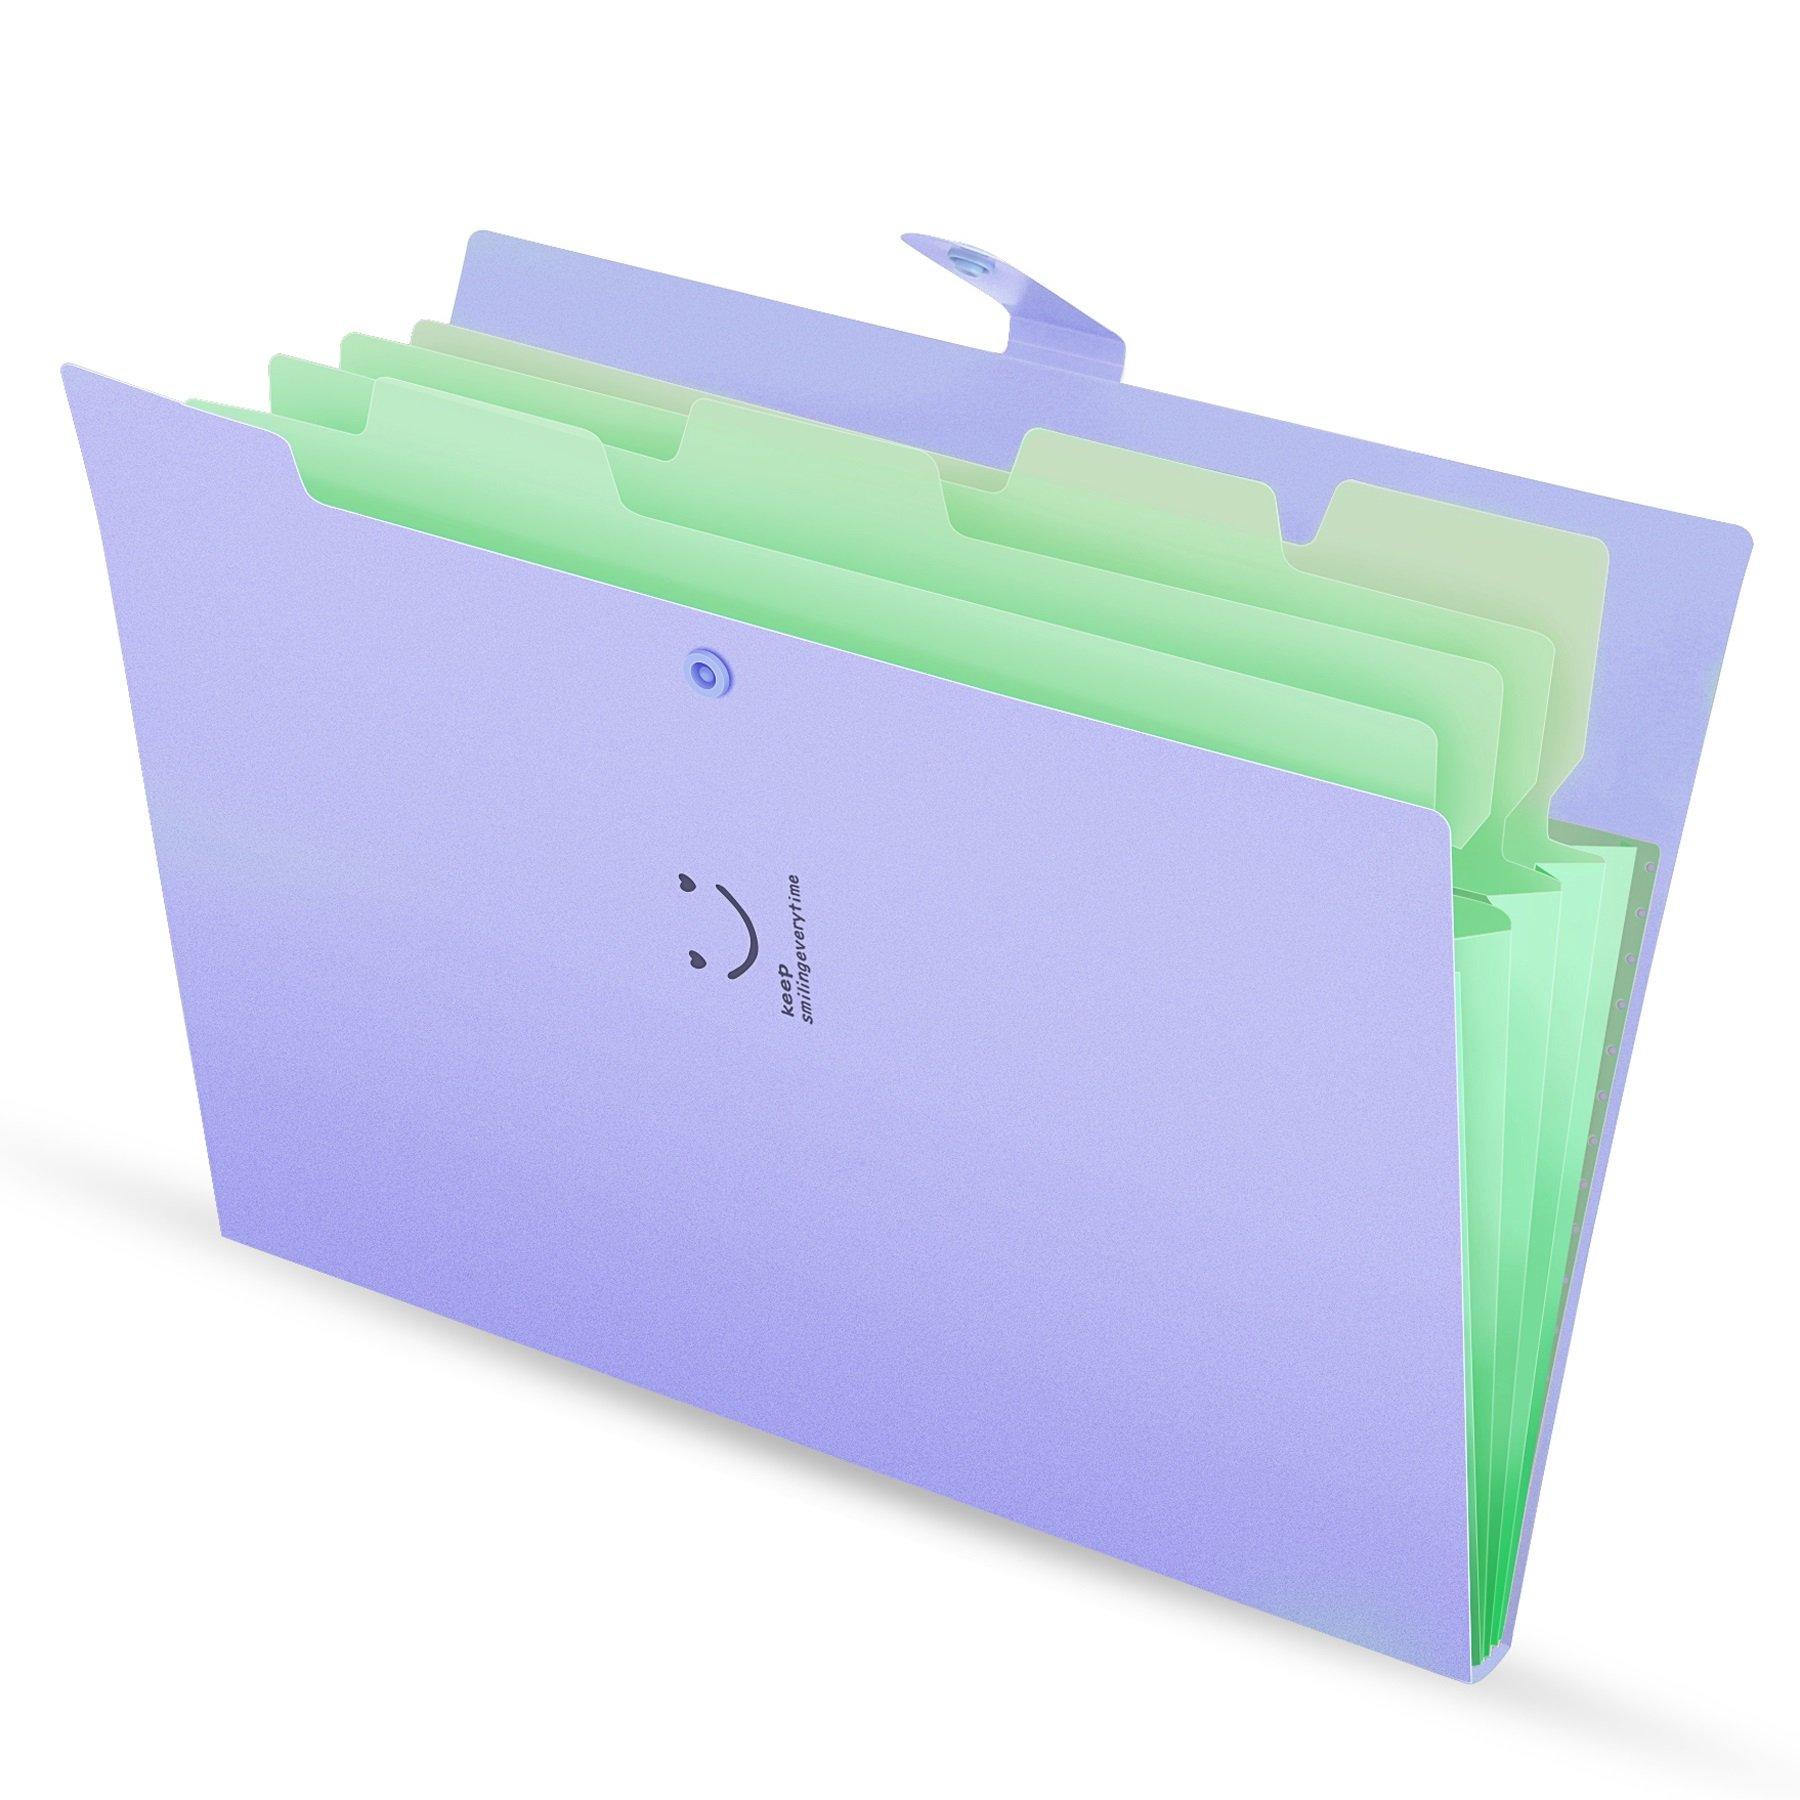 expandable file folder a4 document folder organiser with With document folder with snap button